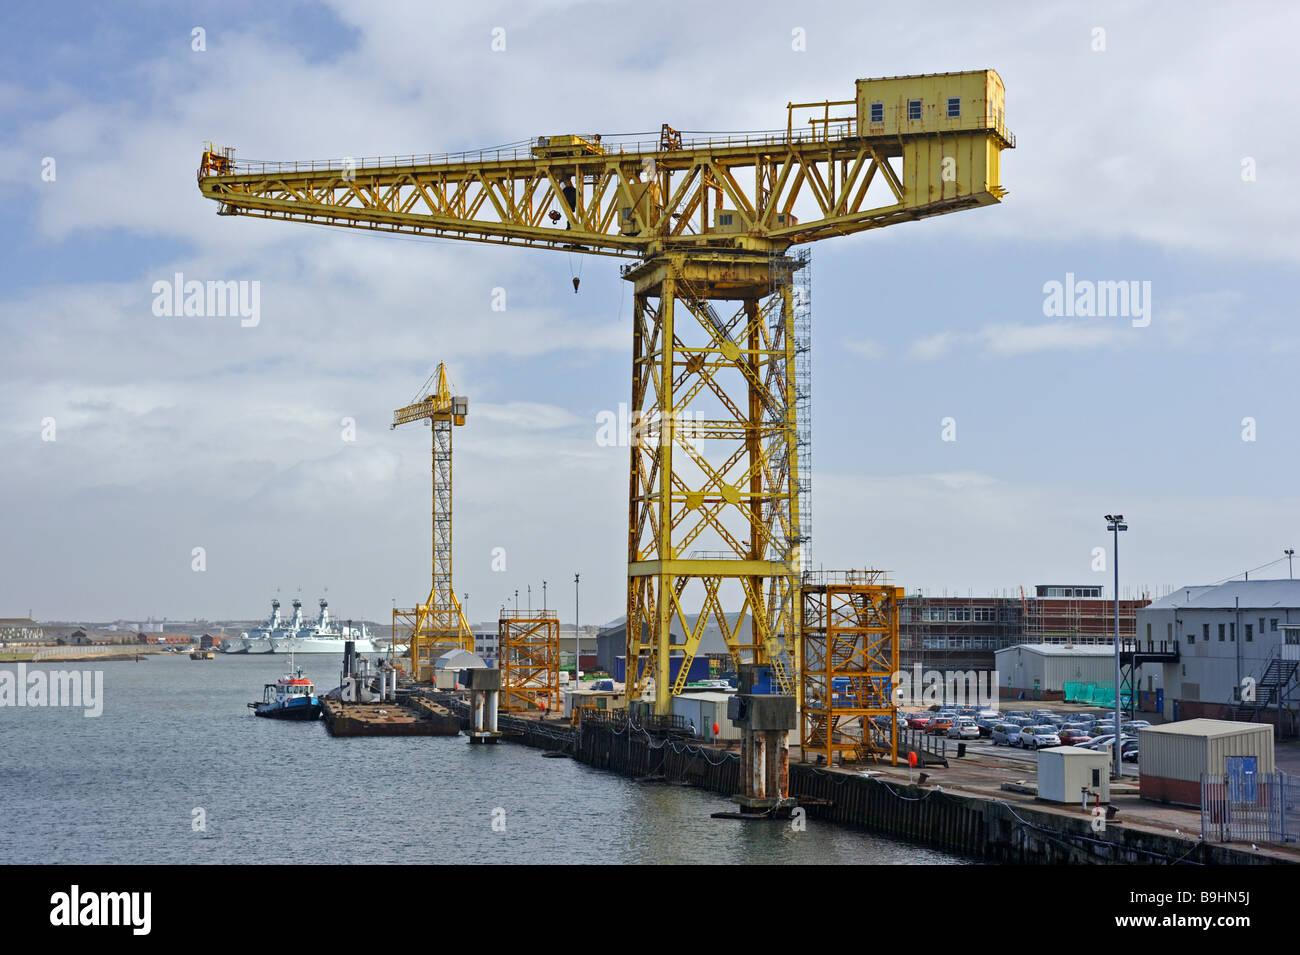 cranes-at-buccleuch-dock-barrow-in-furness-cumbria-england-united-B9HN5J.jpg